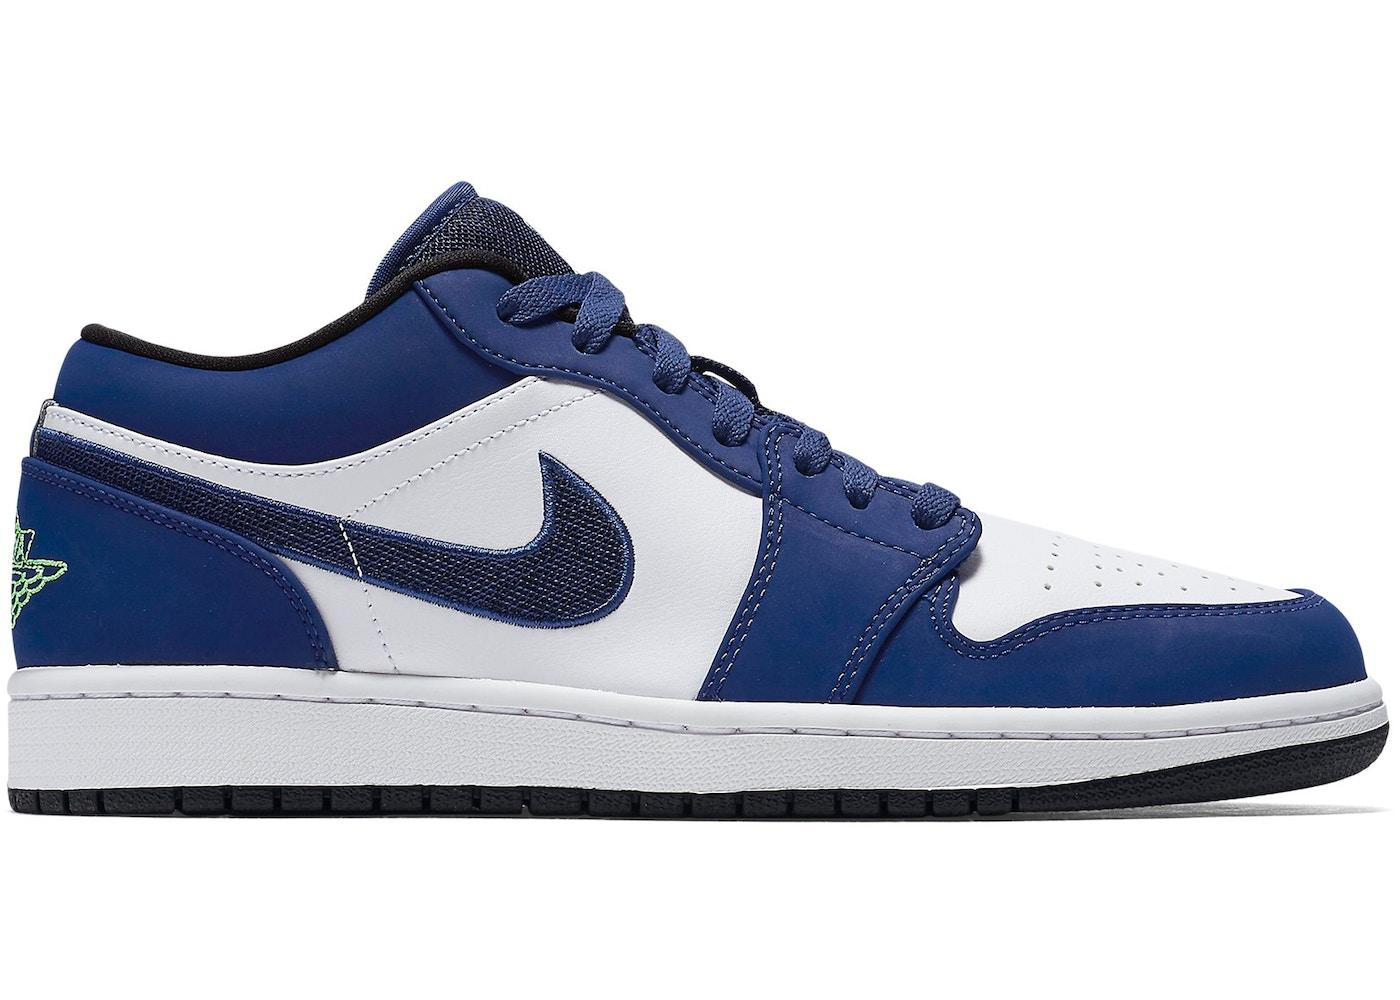 Jordan 1 Low Insignia Blue